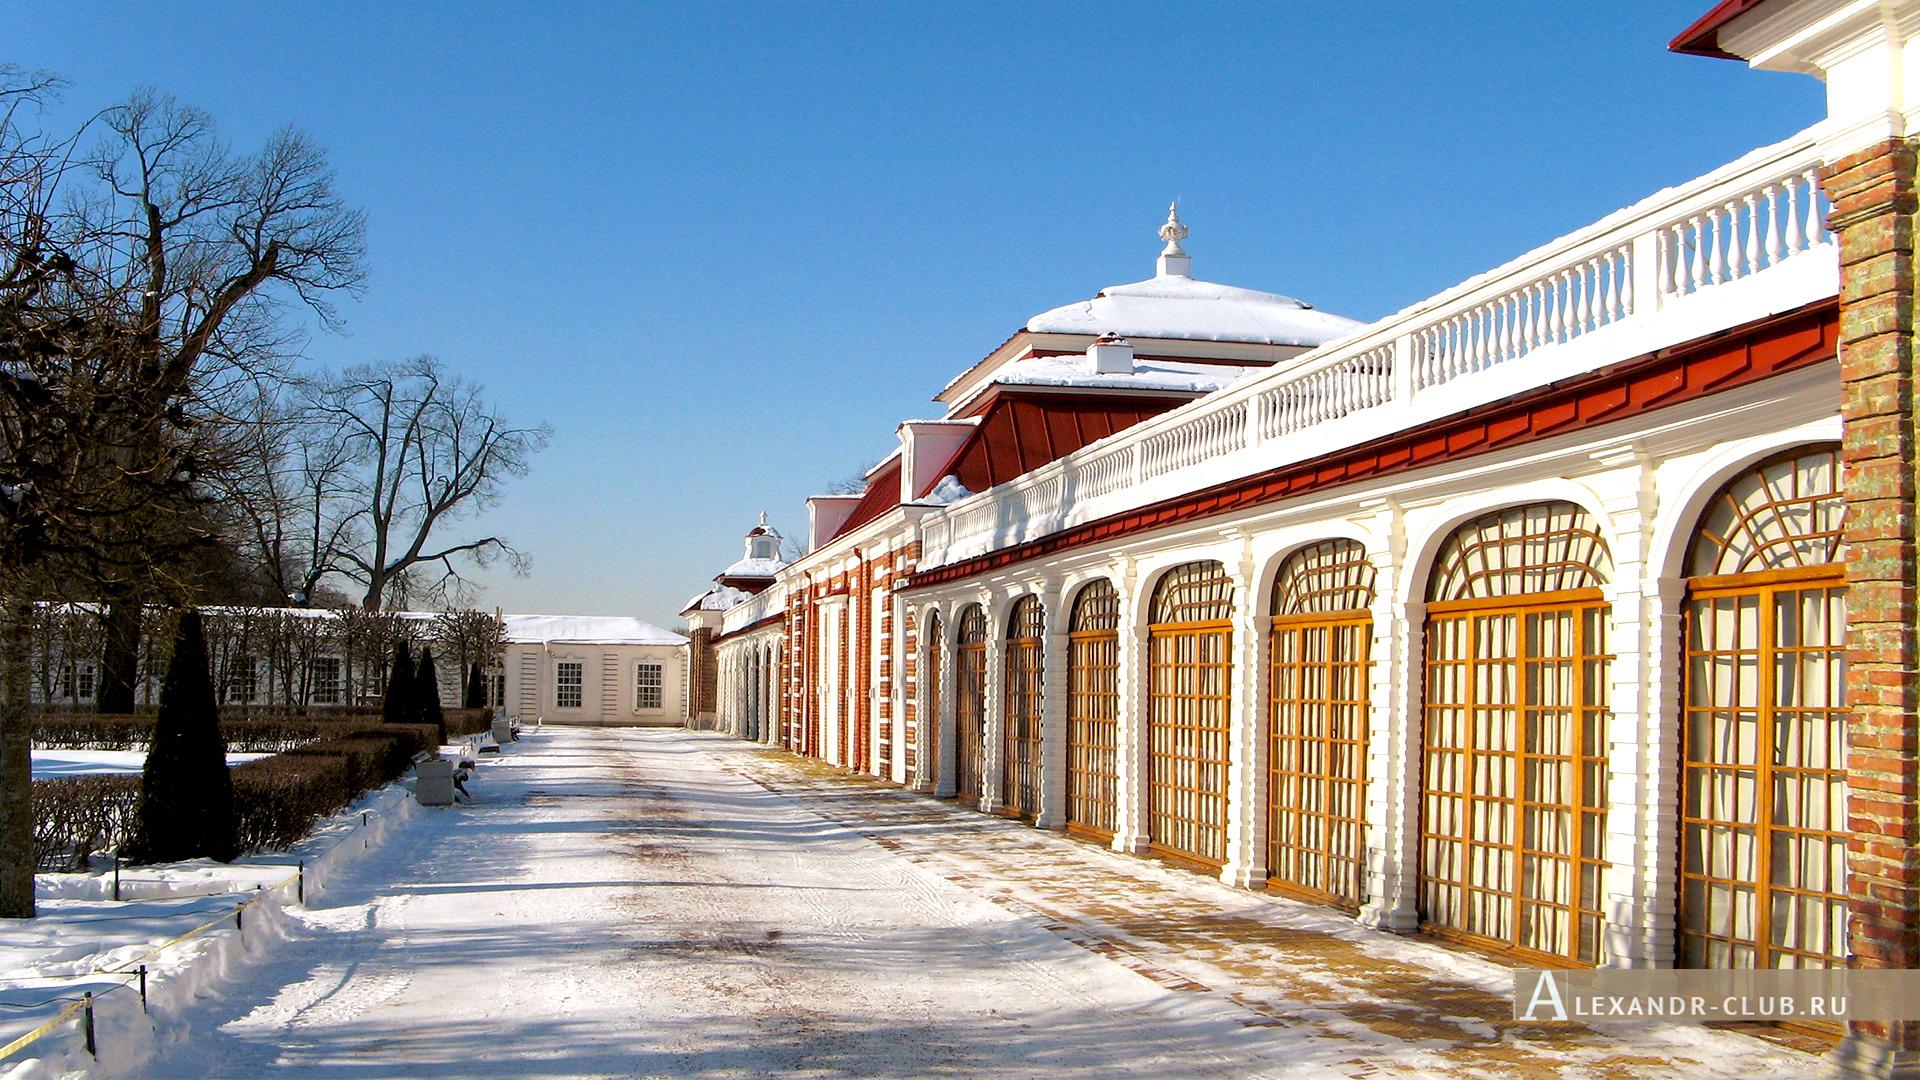 Петергоф, зима, Нижний парк, дворец «Монплезир» – 6